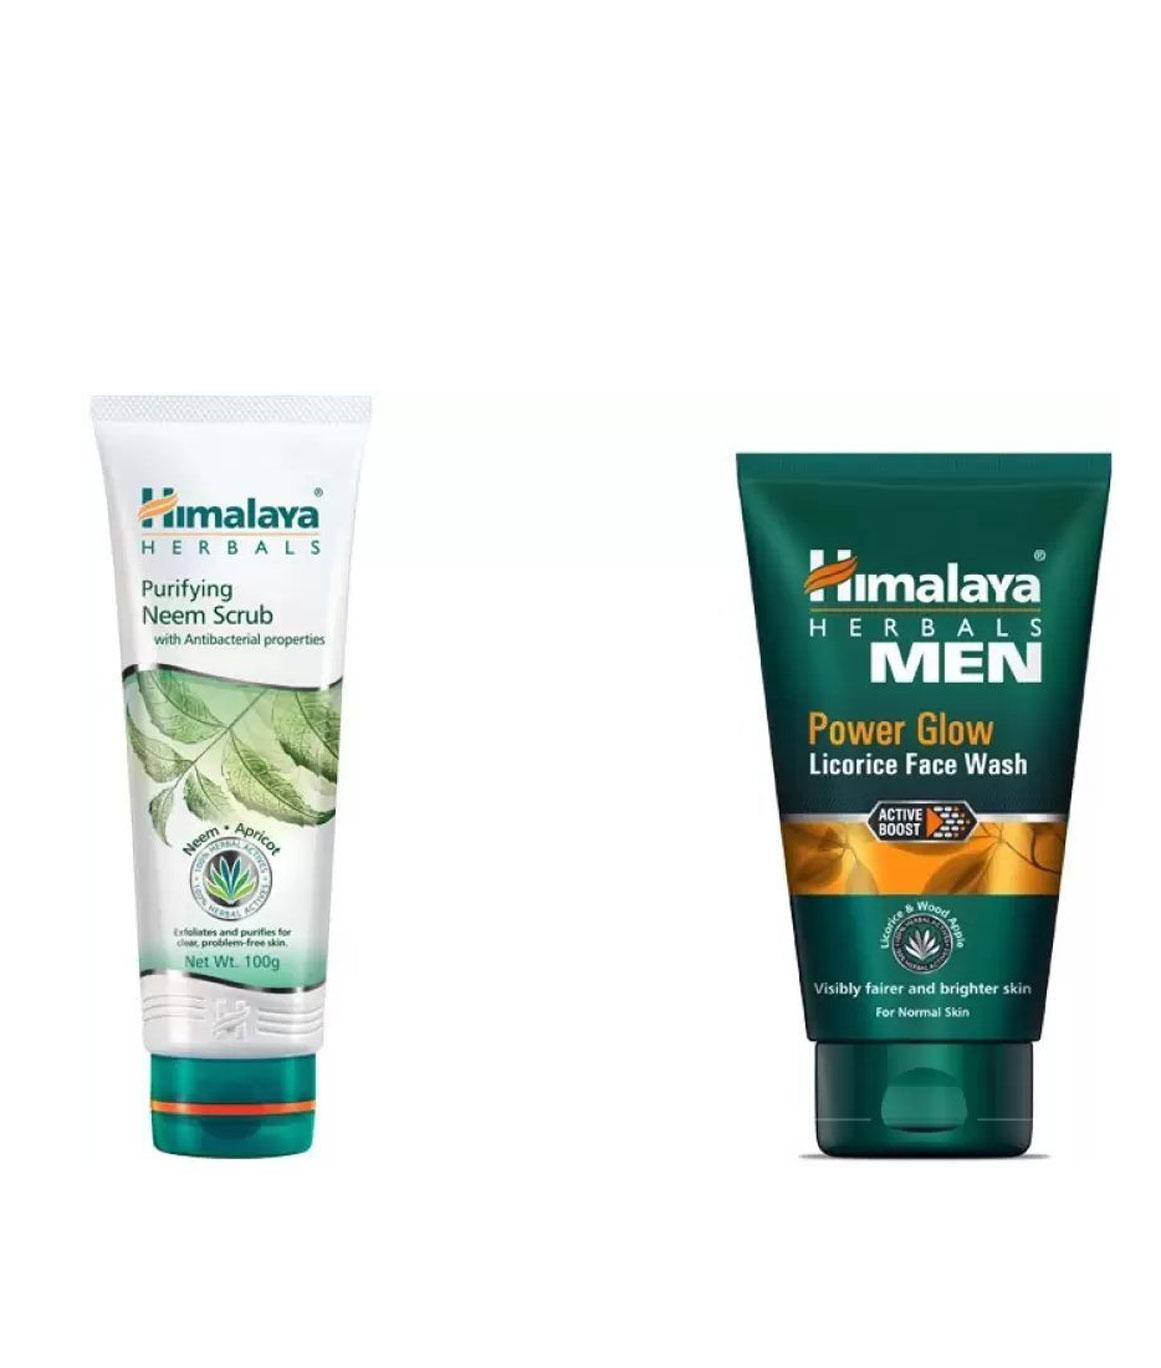 Himalaya Combo of Purifying Neem Scrub Men Power Glow Licorice Face Wash